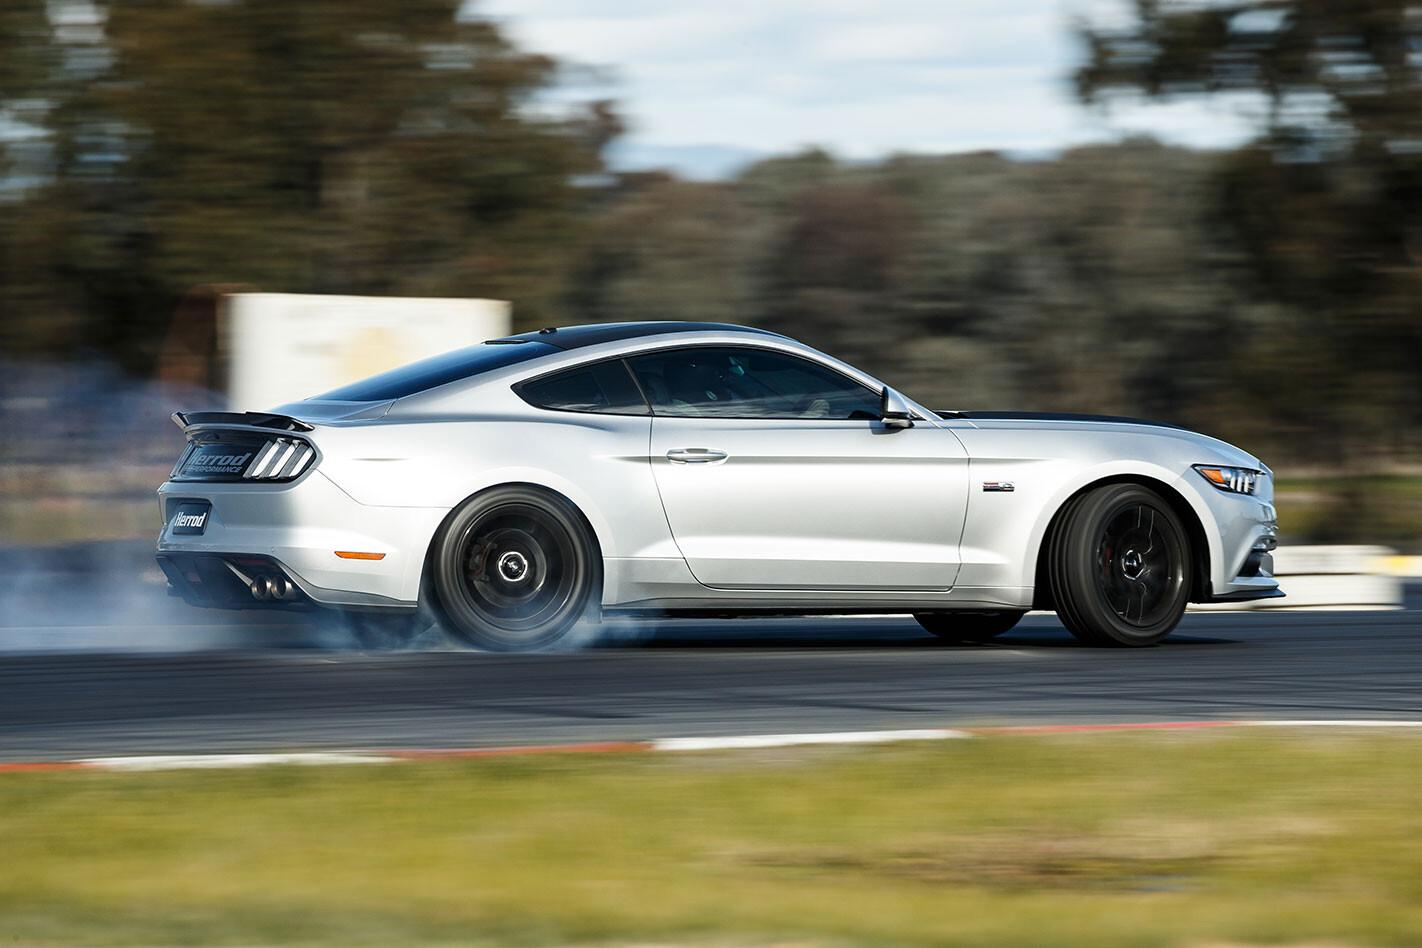 2017 Ford Mustang Herrod Performance Compliance Pack Jpg